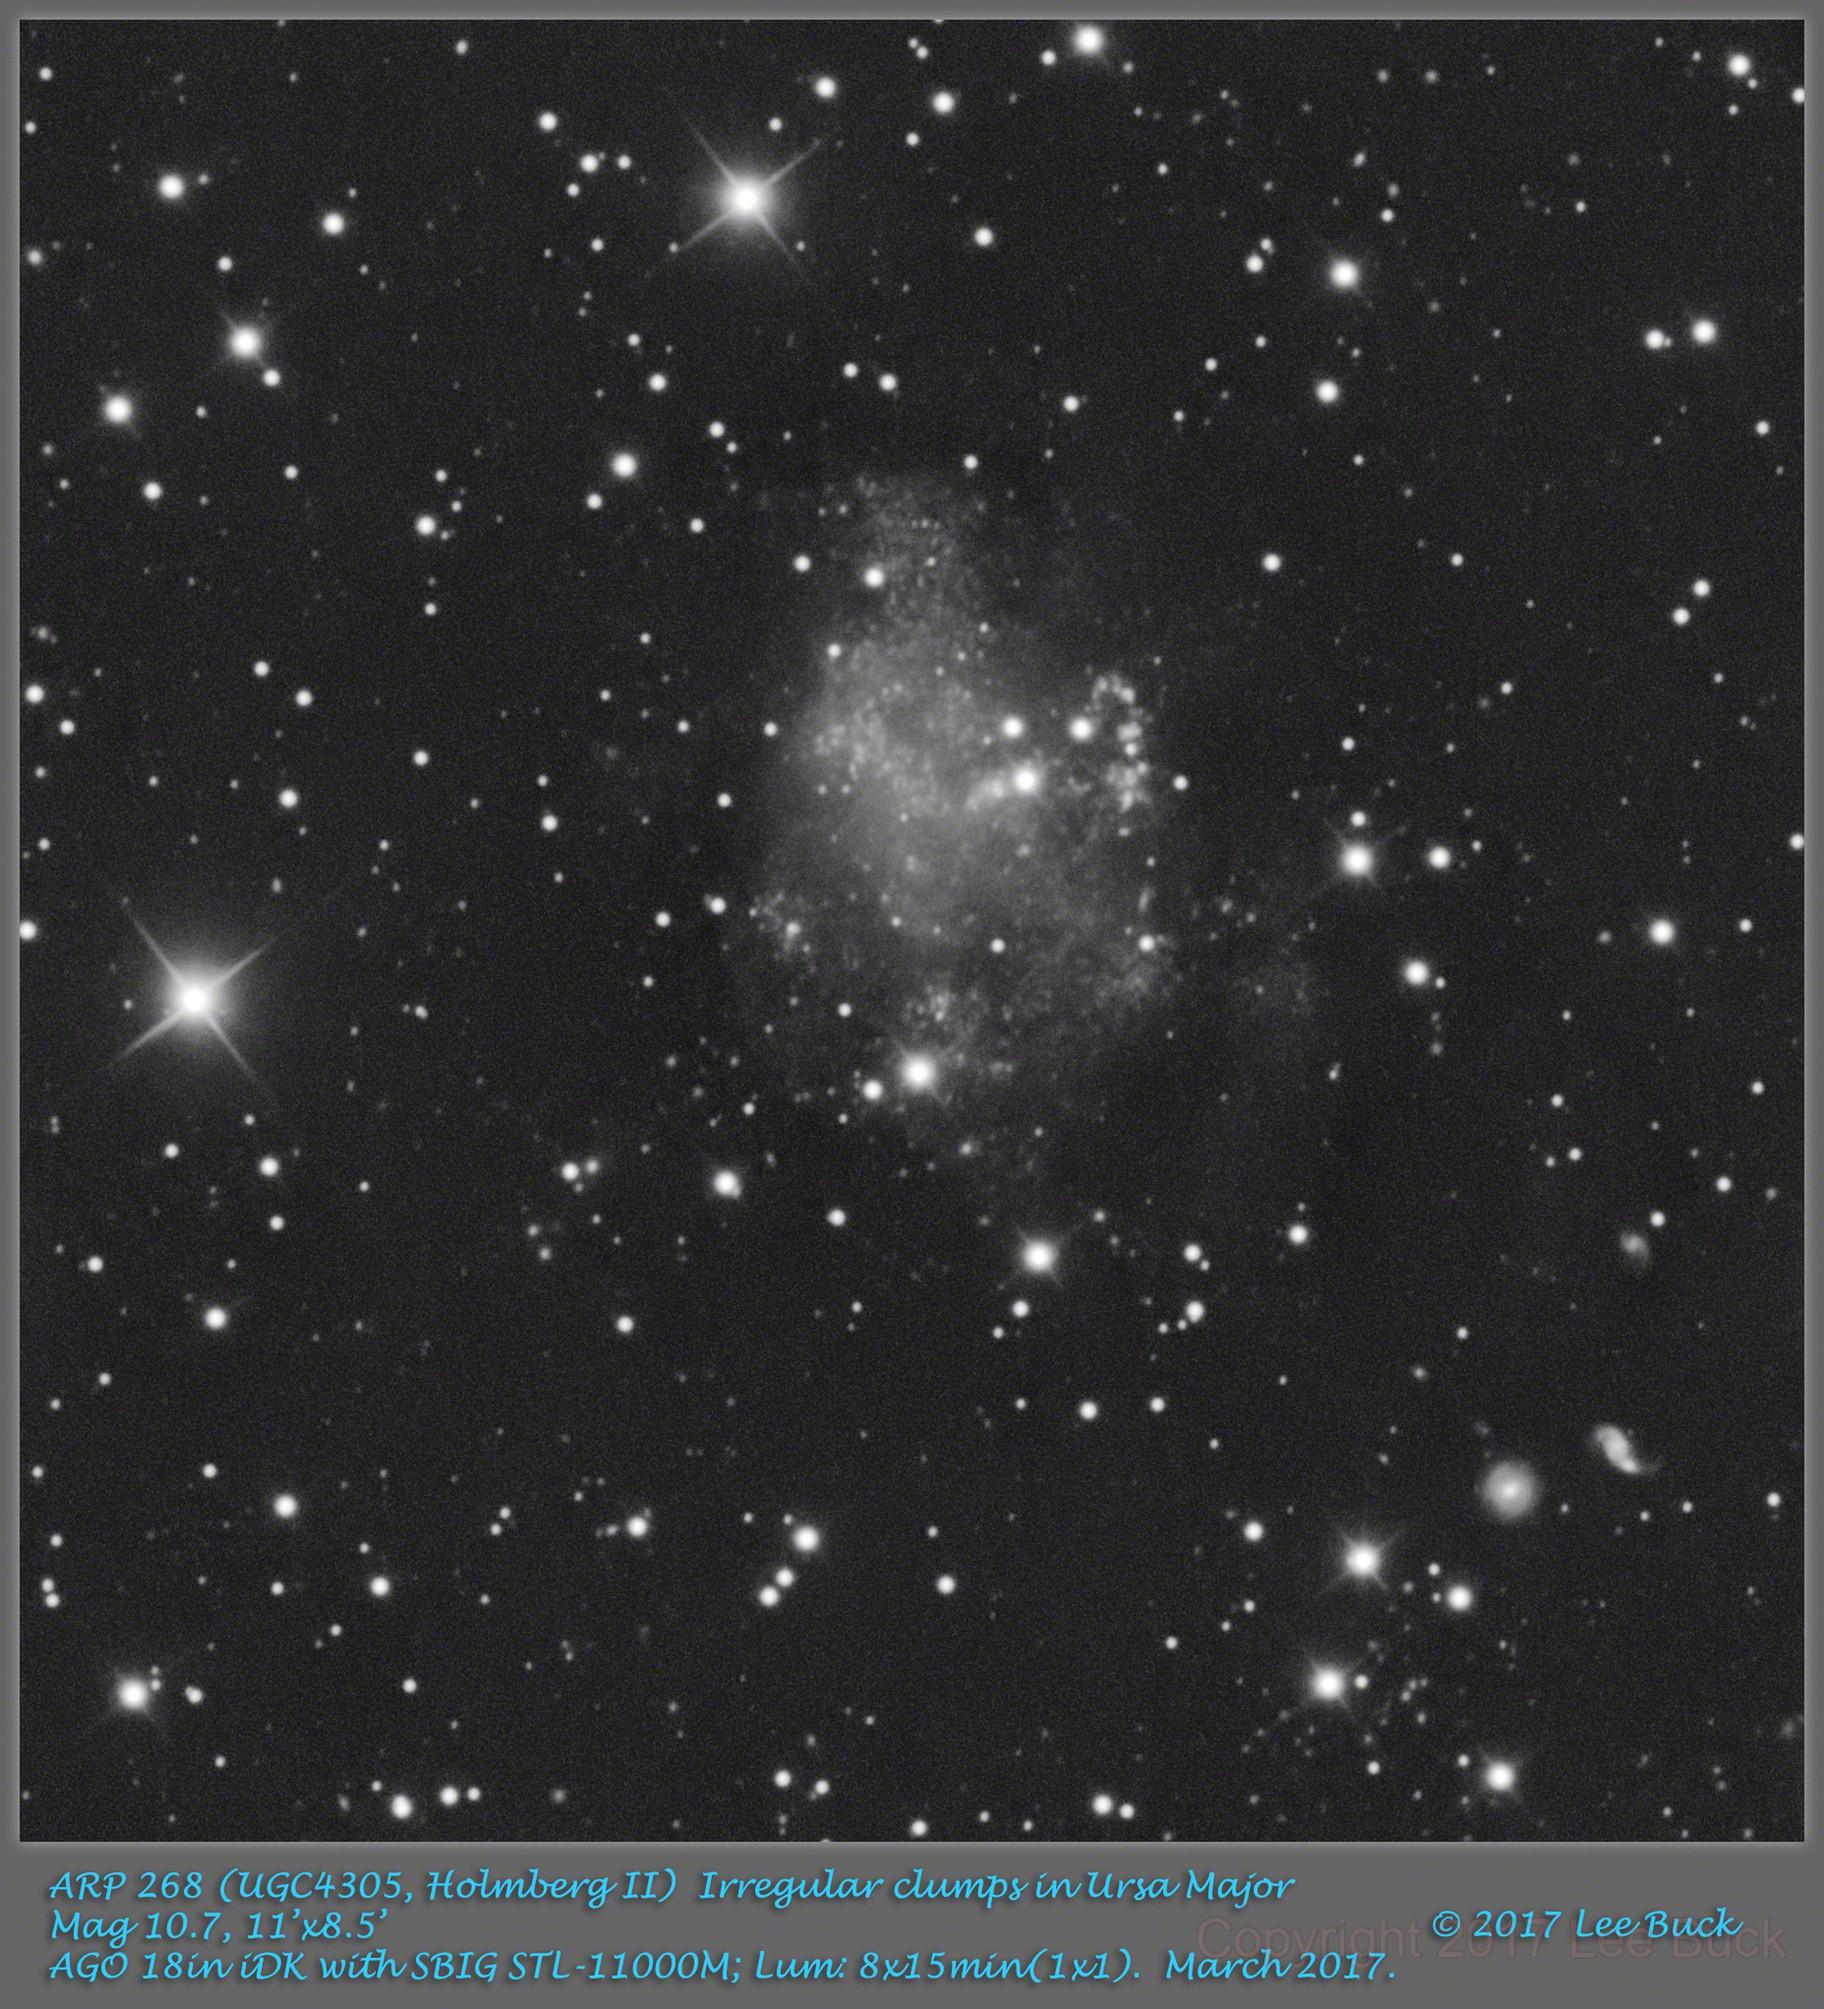 ARP 268 (UGC4305, Holmberg II)  Irregular clumps in Ursa Major